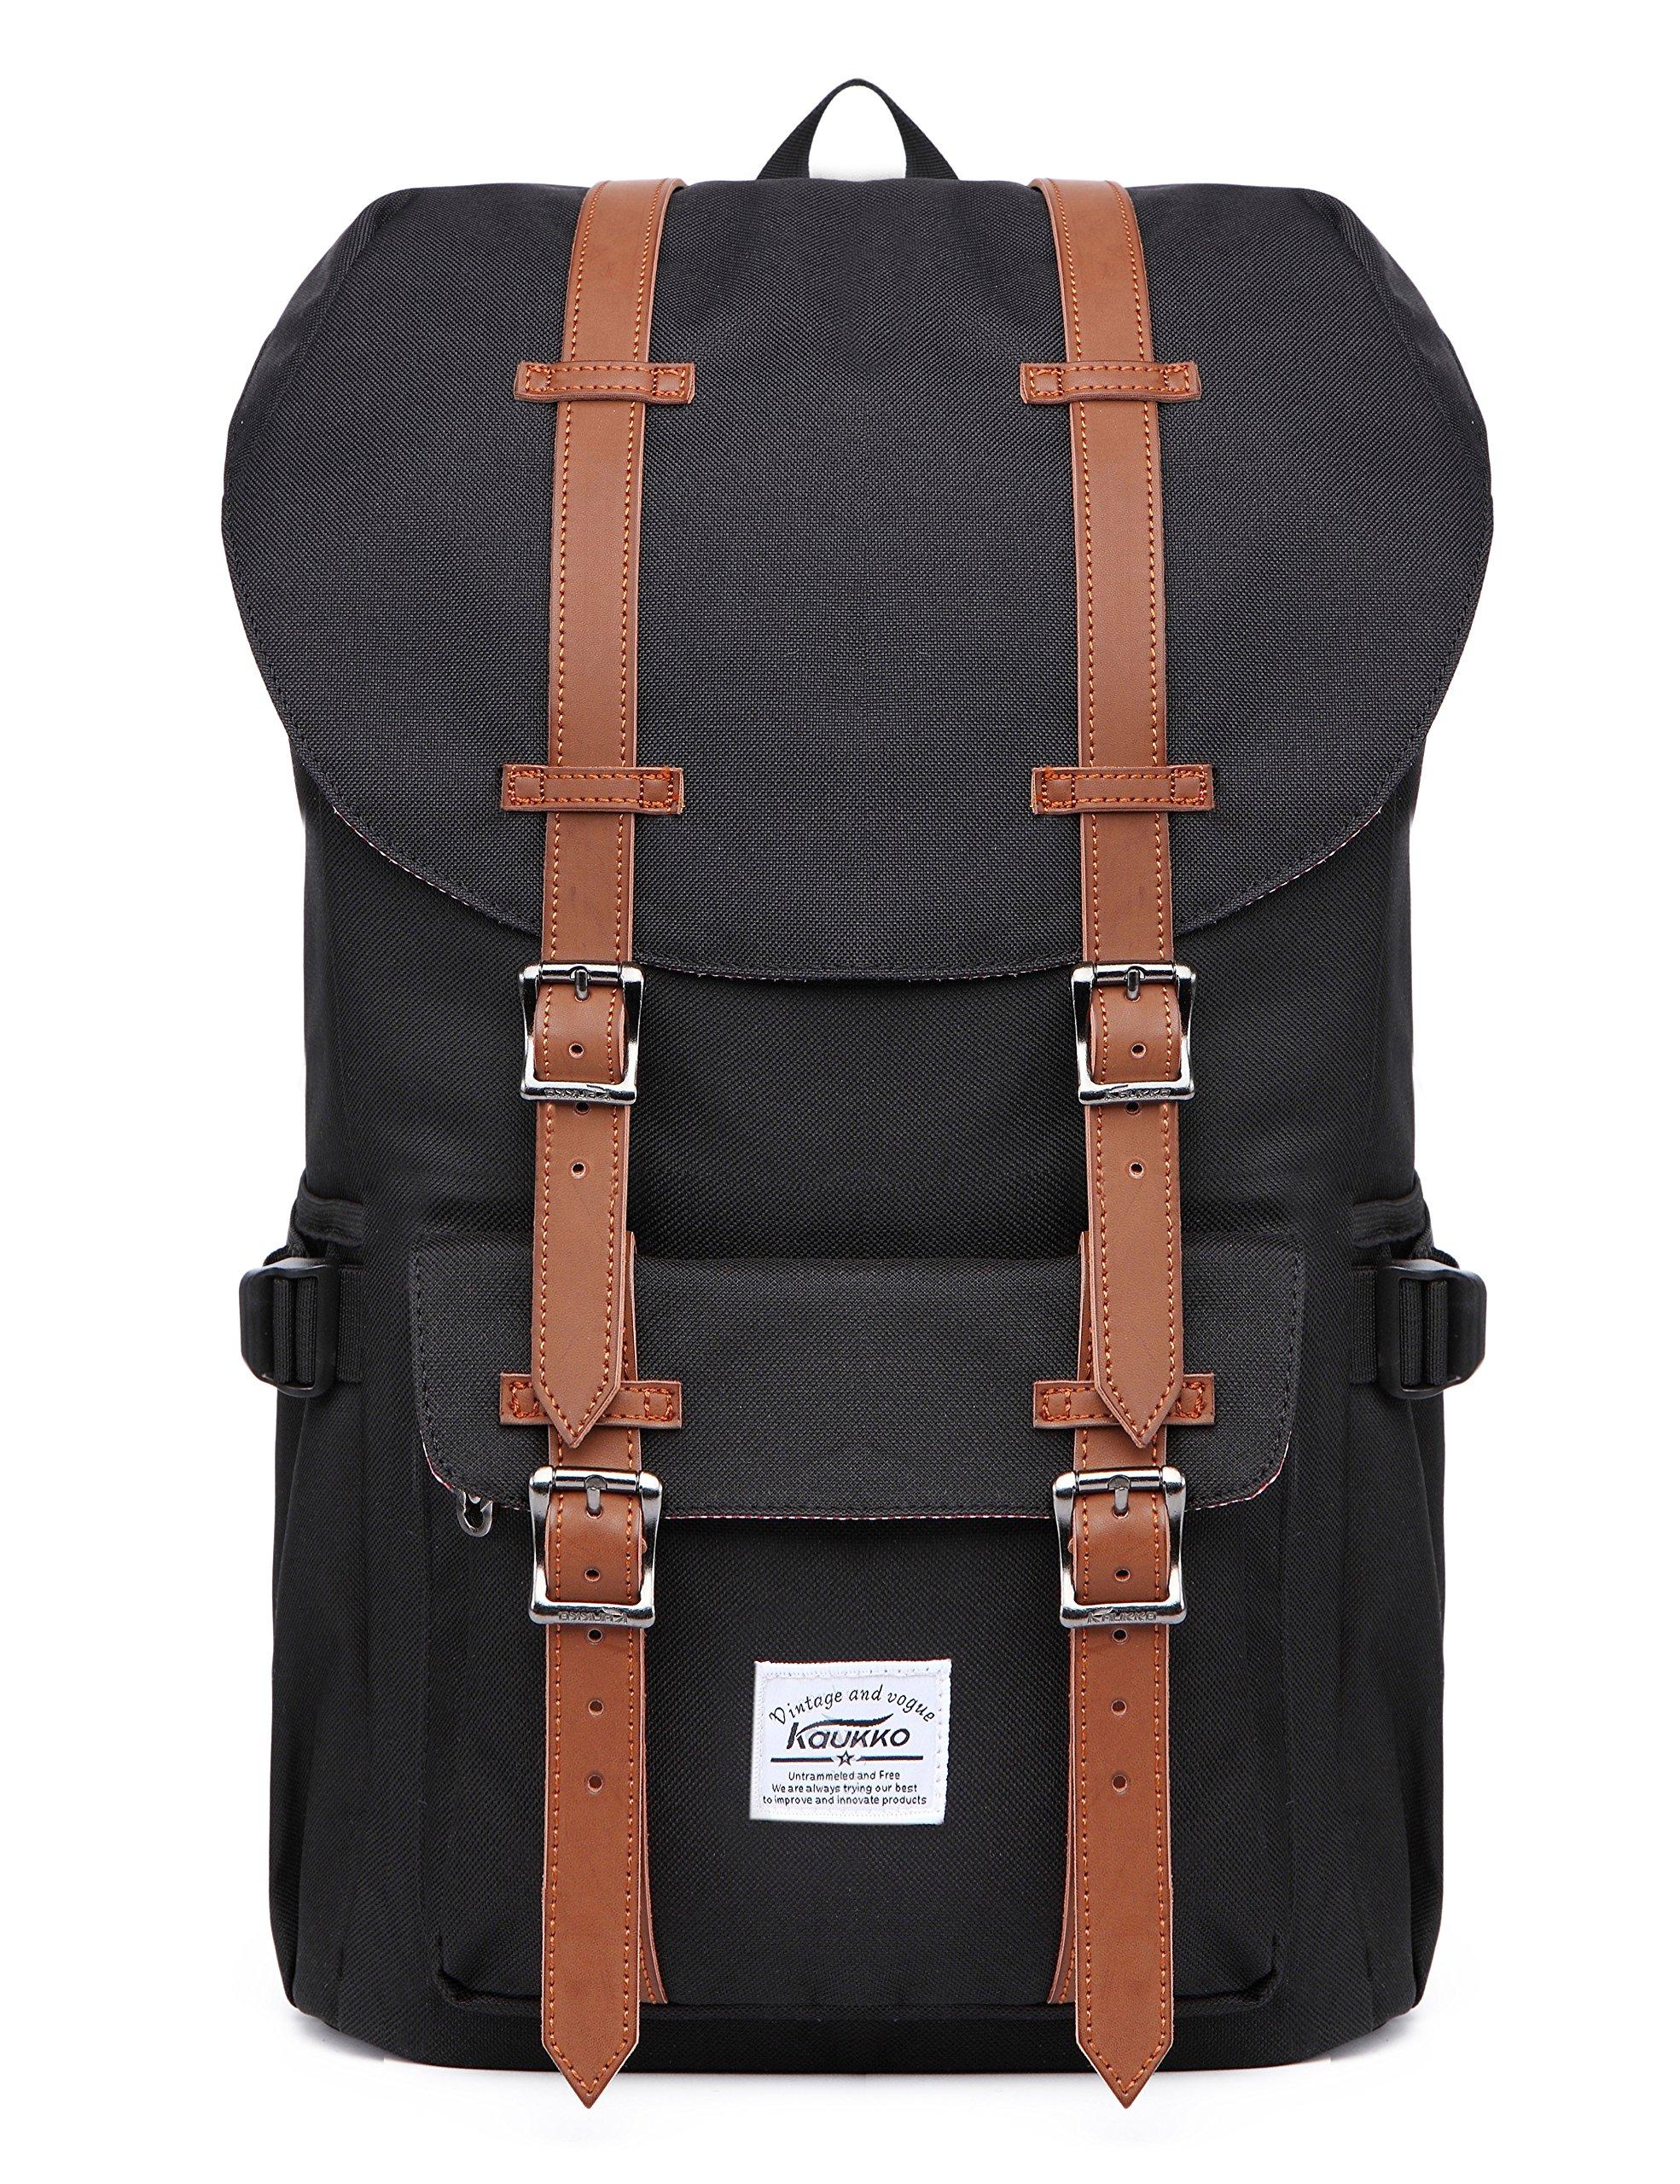 KAUKKO Laptop Outdoor Backpack, Travel Hiking& Camping Rucksack Pack, Casual Large College School Daypack, Shoulder Book Bags Back Fits 15'' Laptop & Tablets (Nblack) by KAUKKO